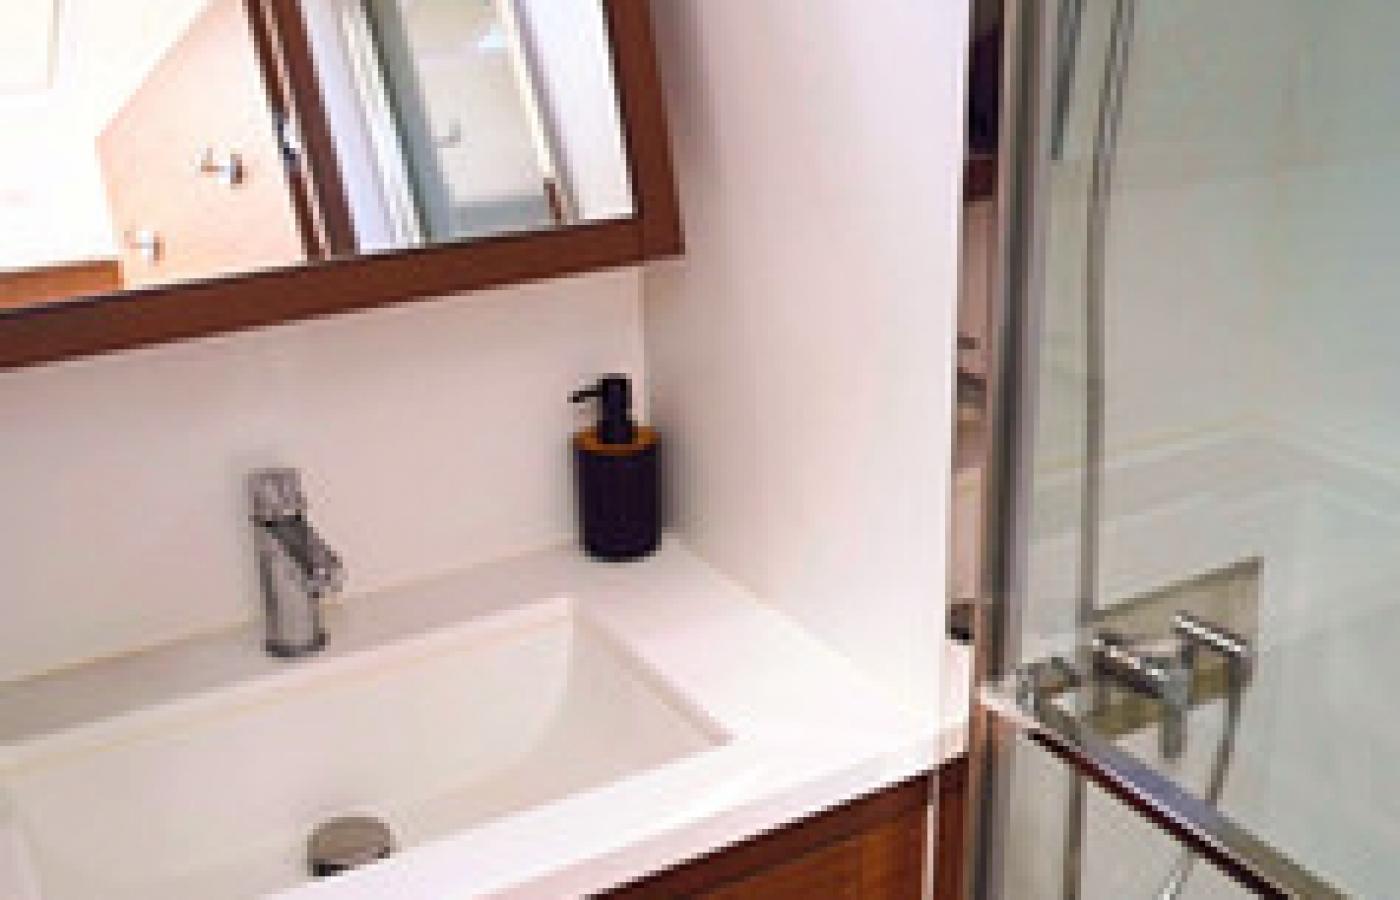 Sink, shower with mirror cabinet